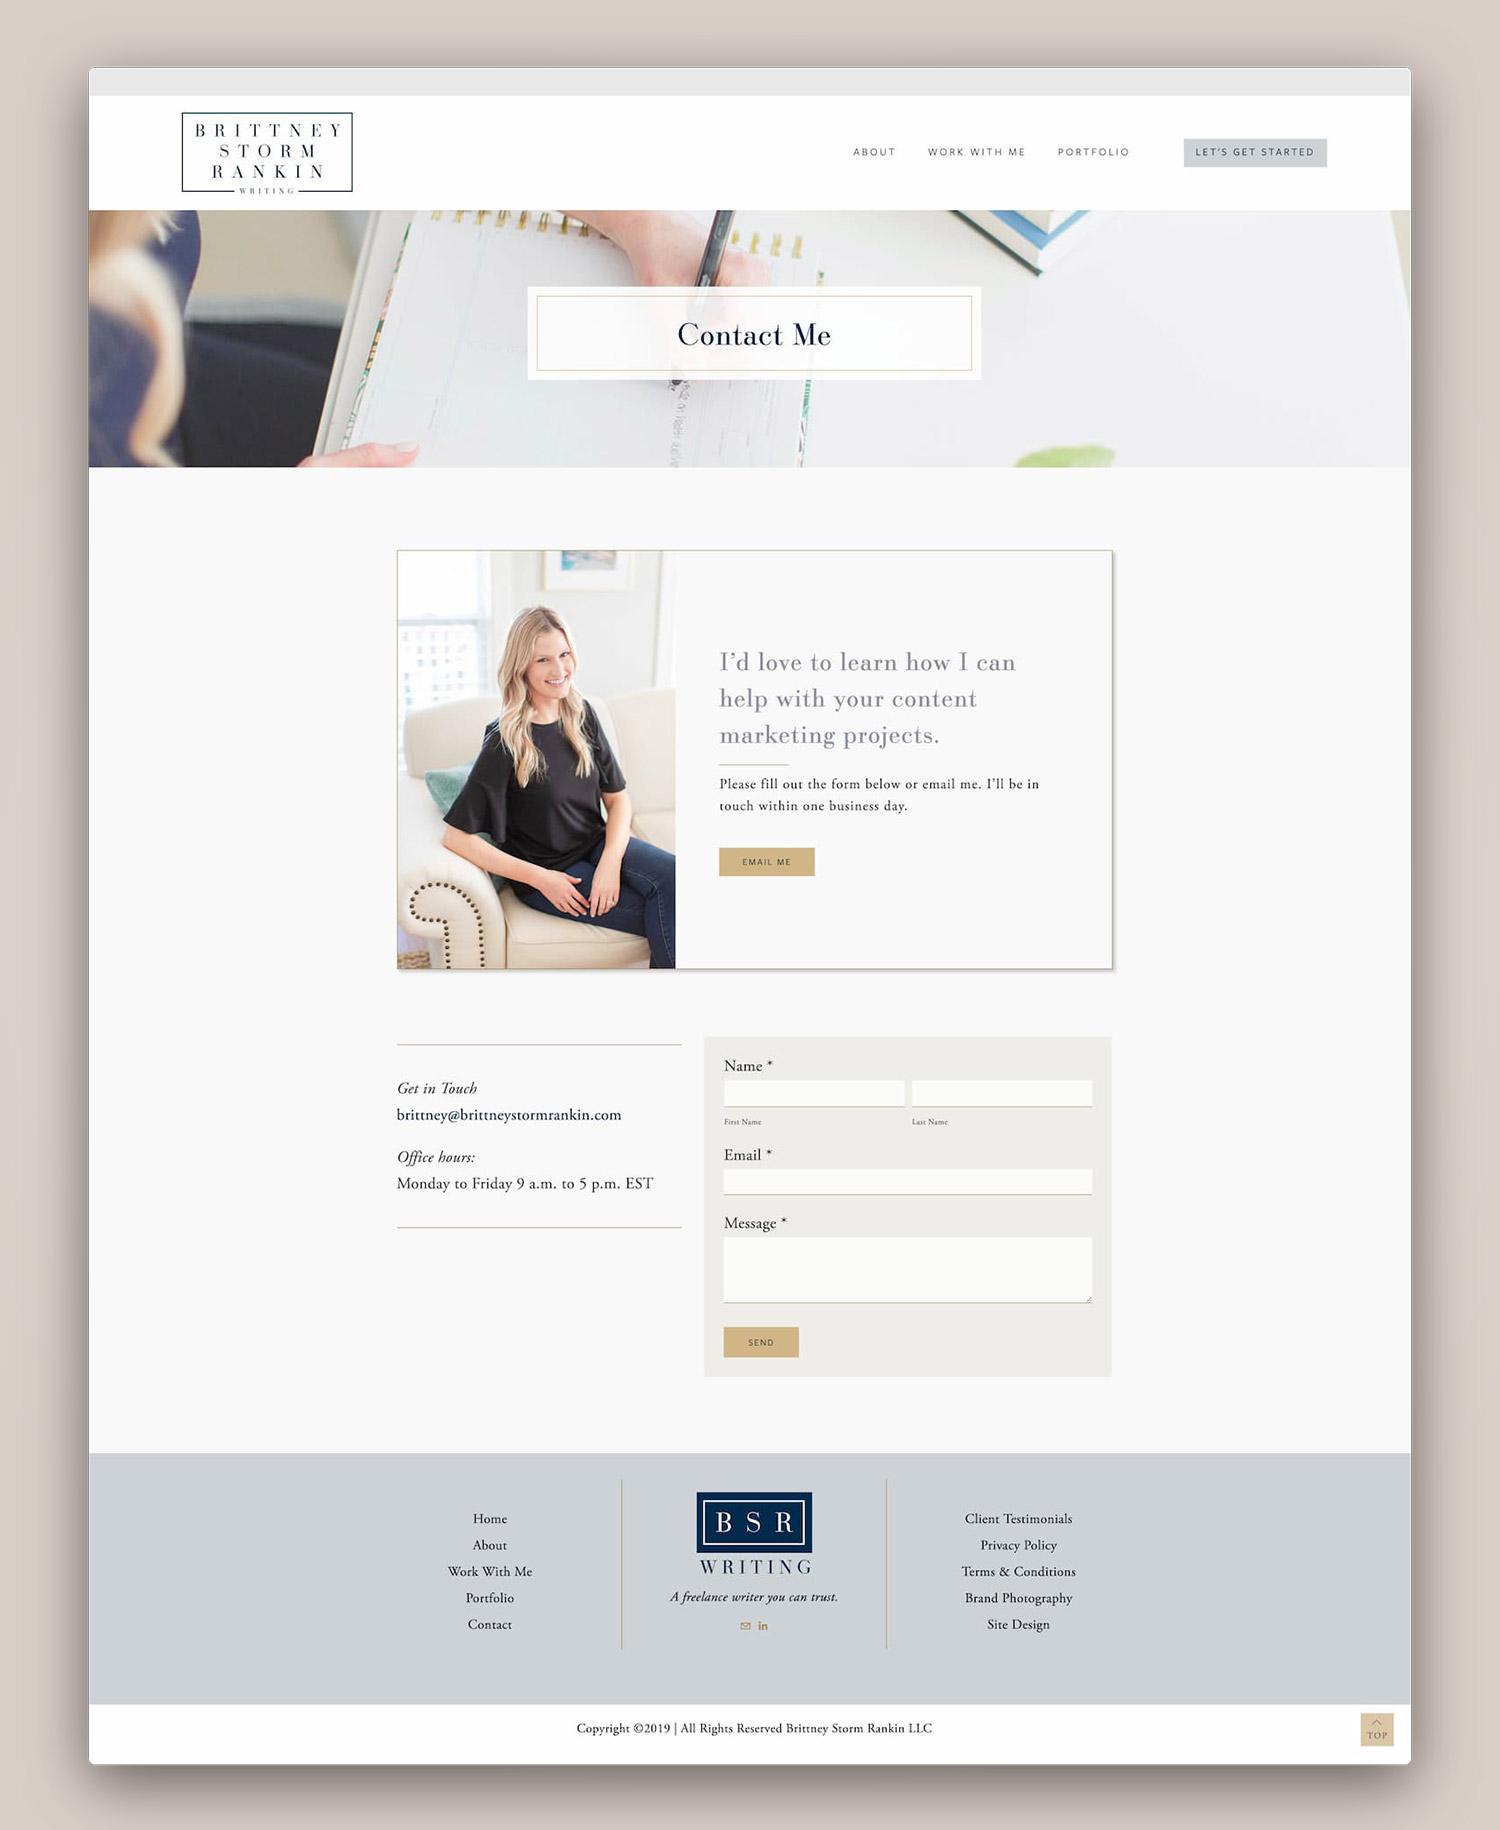 Contact Page _ Brittney Storm Rankin Writing _ by Jodi Neufeld Design.jpg